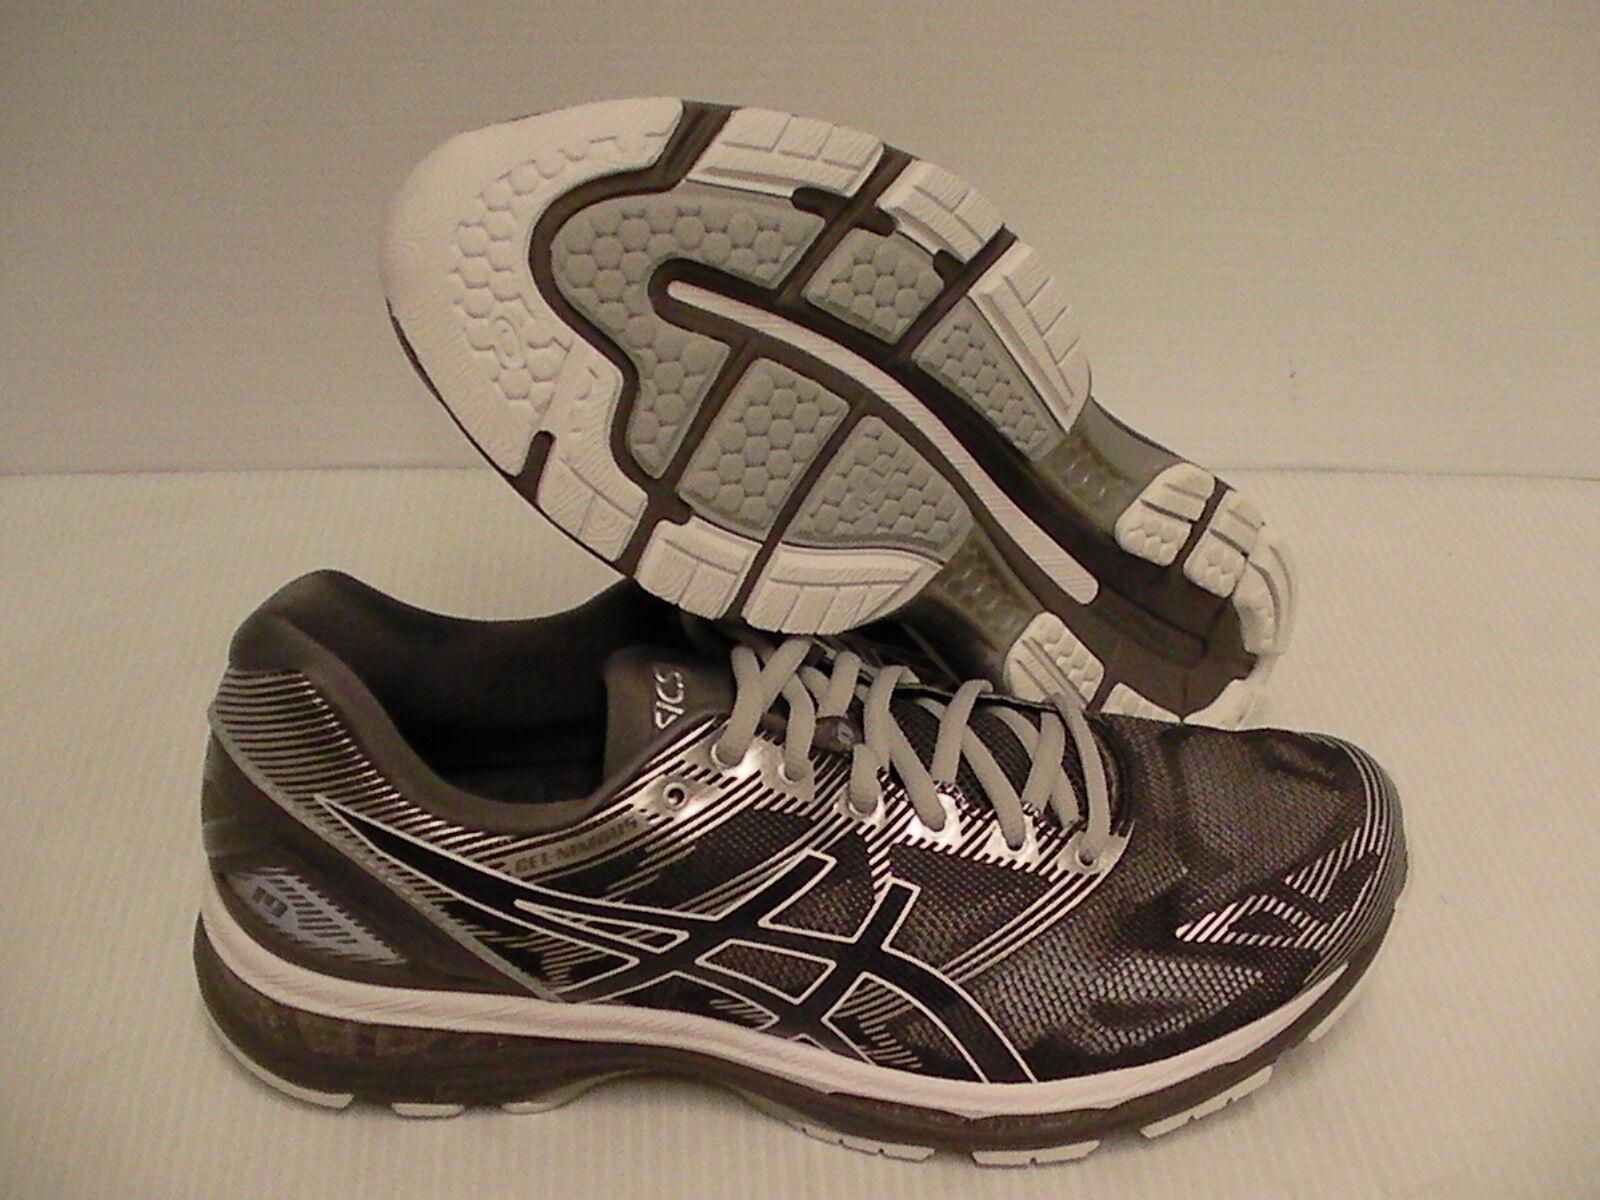 19 Chaussures Running Gel Nimbus Homme Carbon Asics zIqCPP